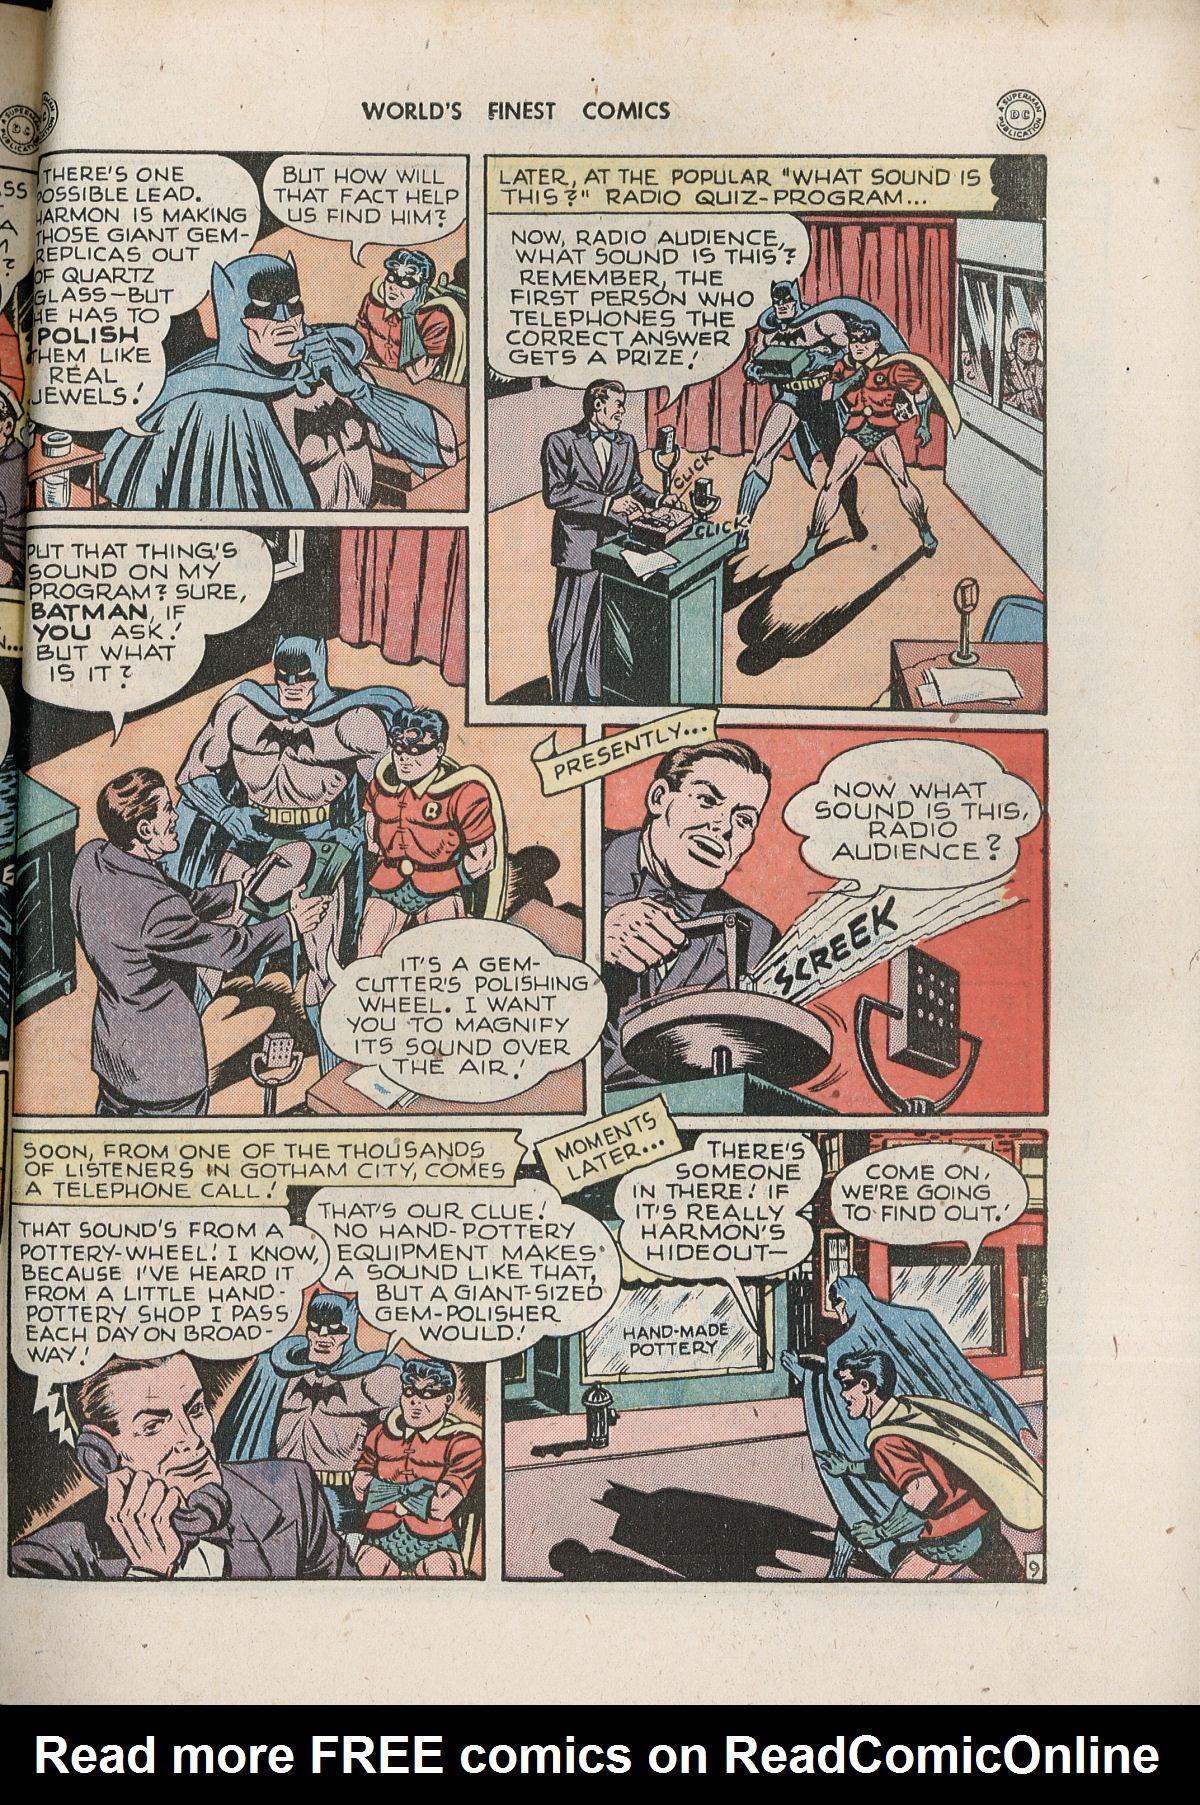 Read online World's Finest Comics comic -  Issue #33 - 69